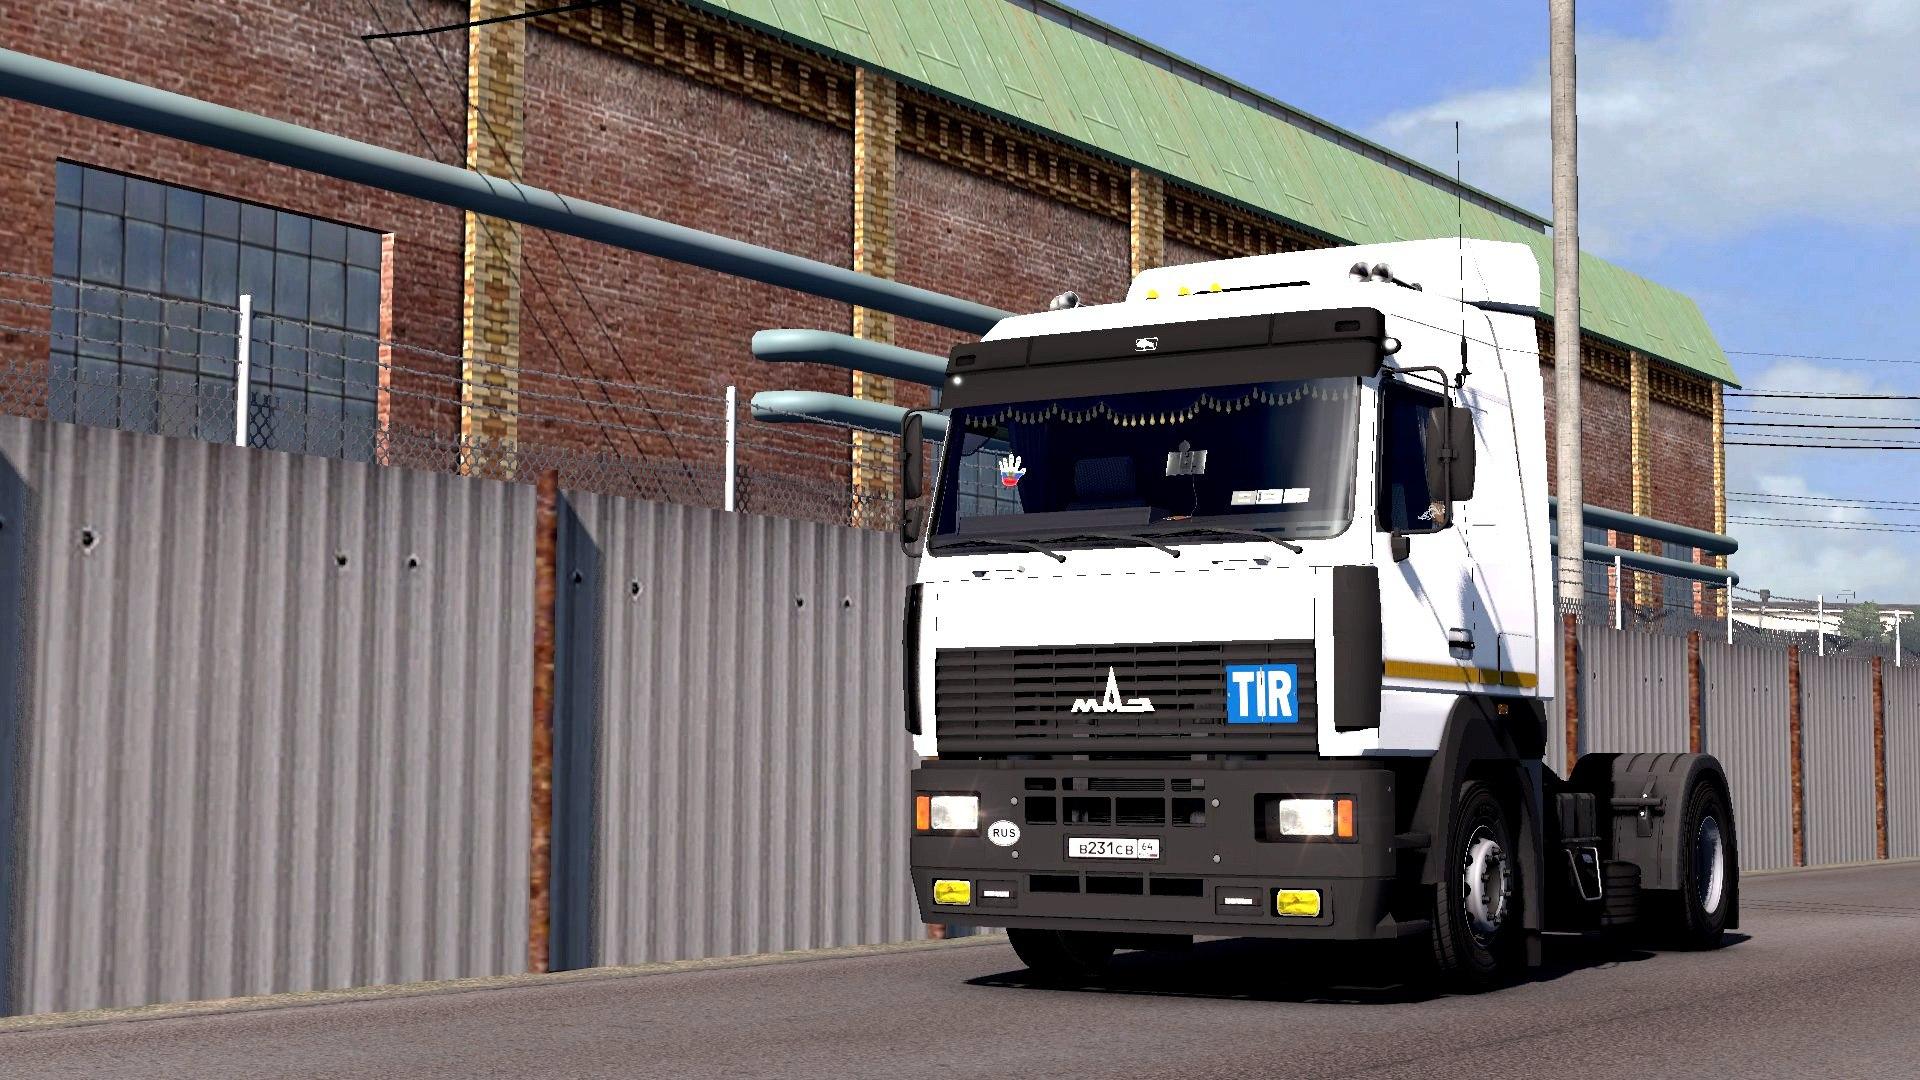 MqHgNInNfkk.jpg - Euro Truck Simulator 2